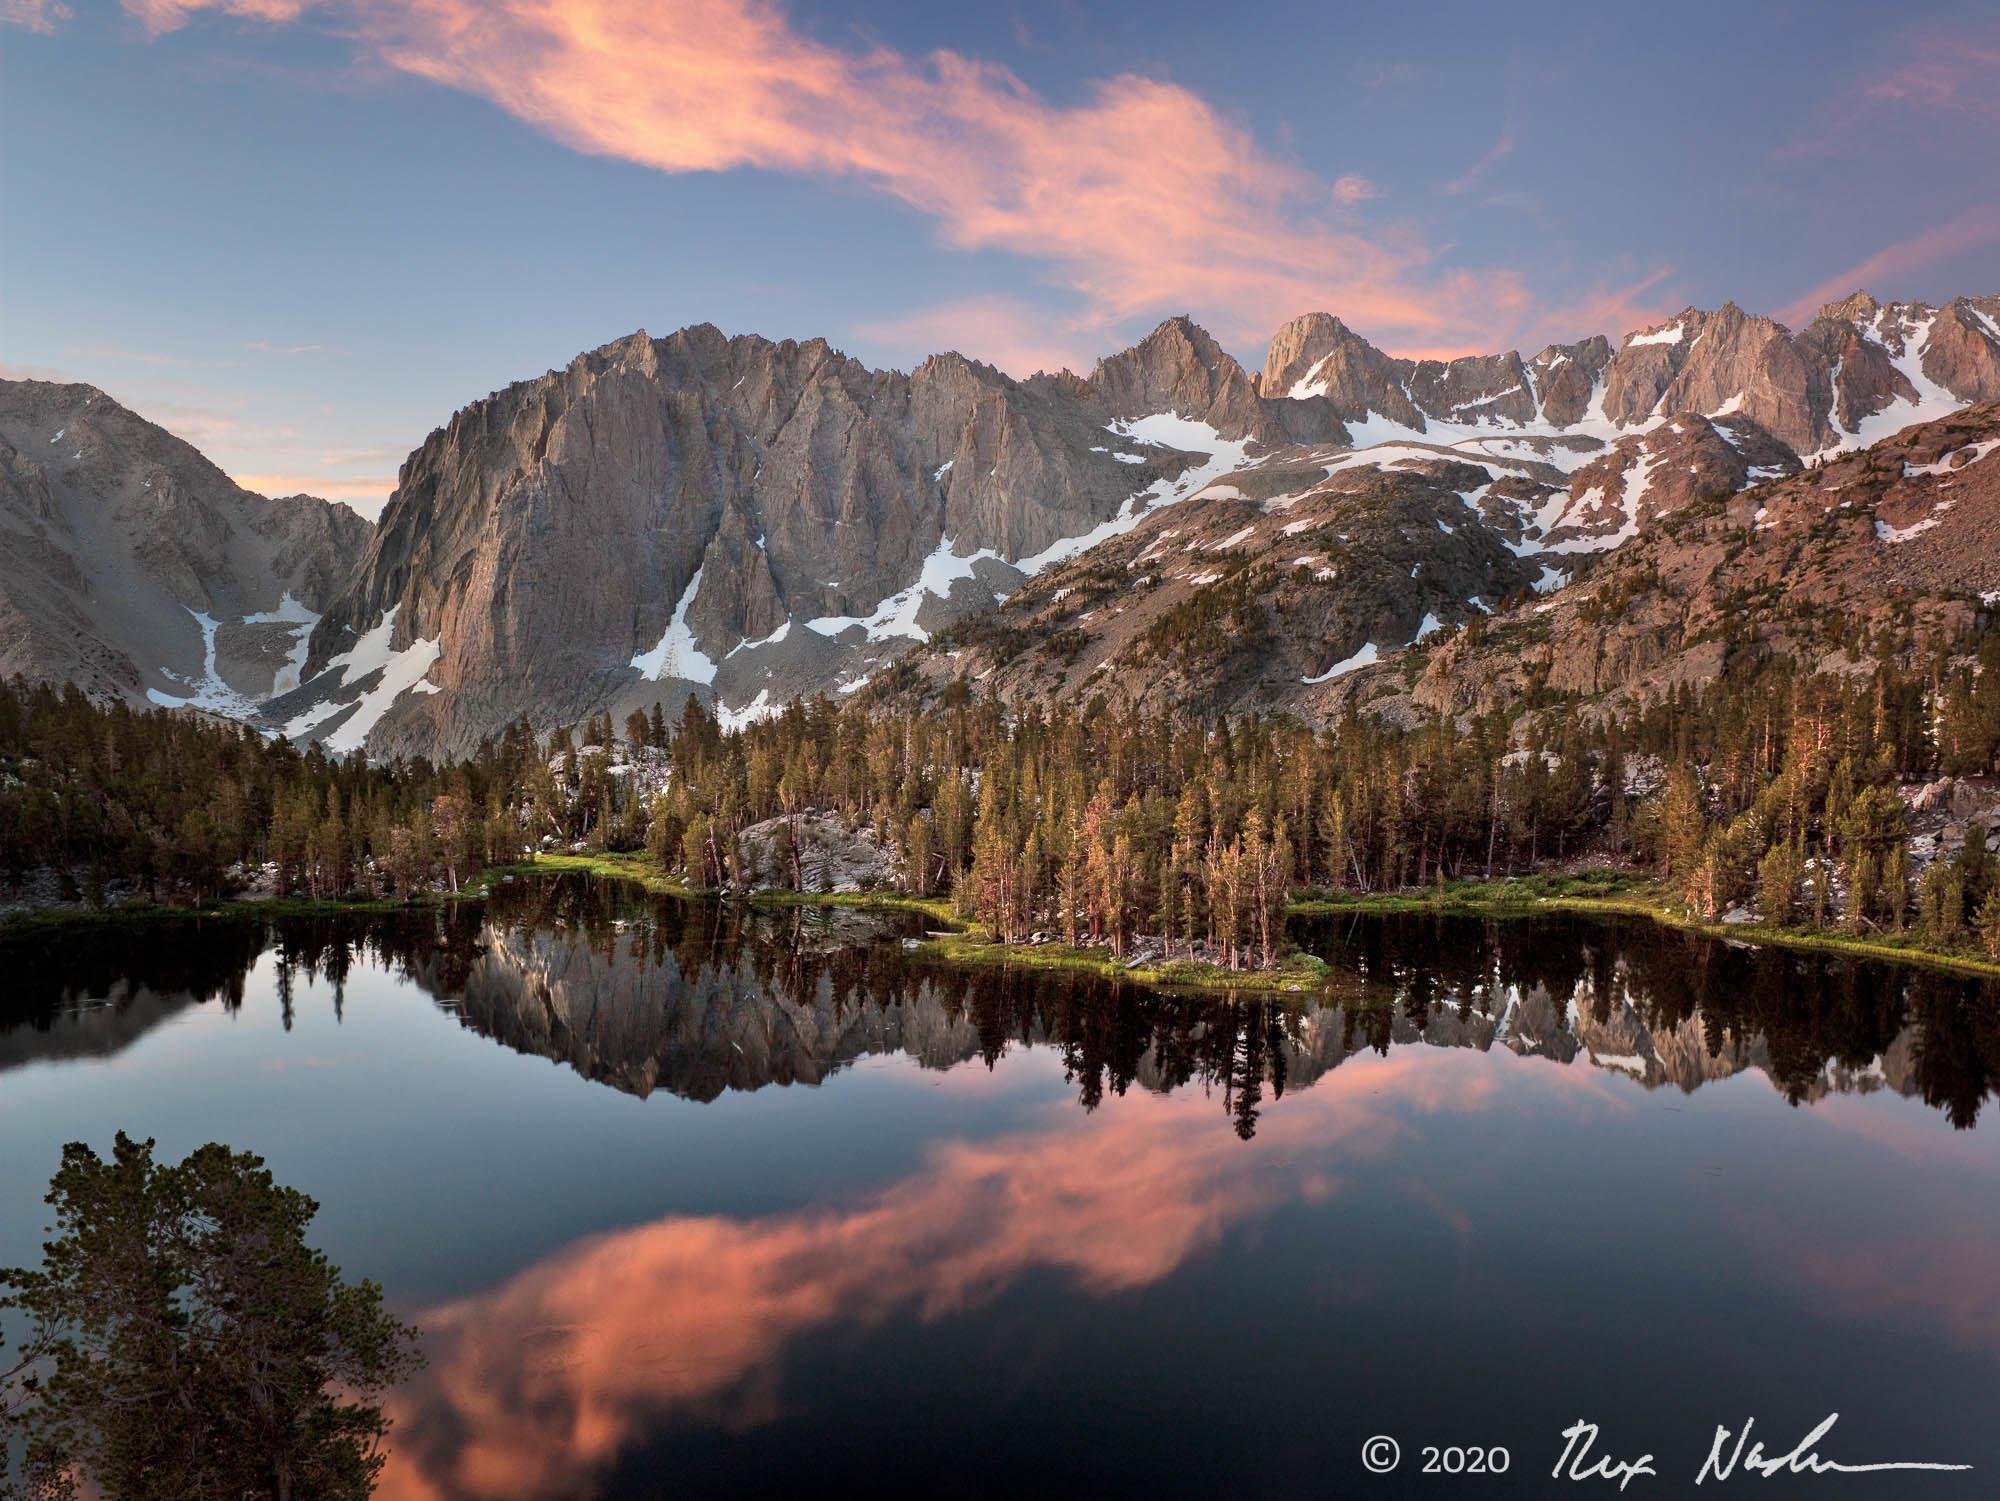 Iridescence - Palisade Glacier Area, High Sierra